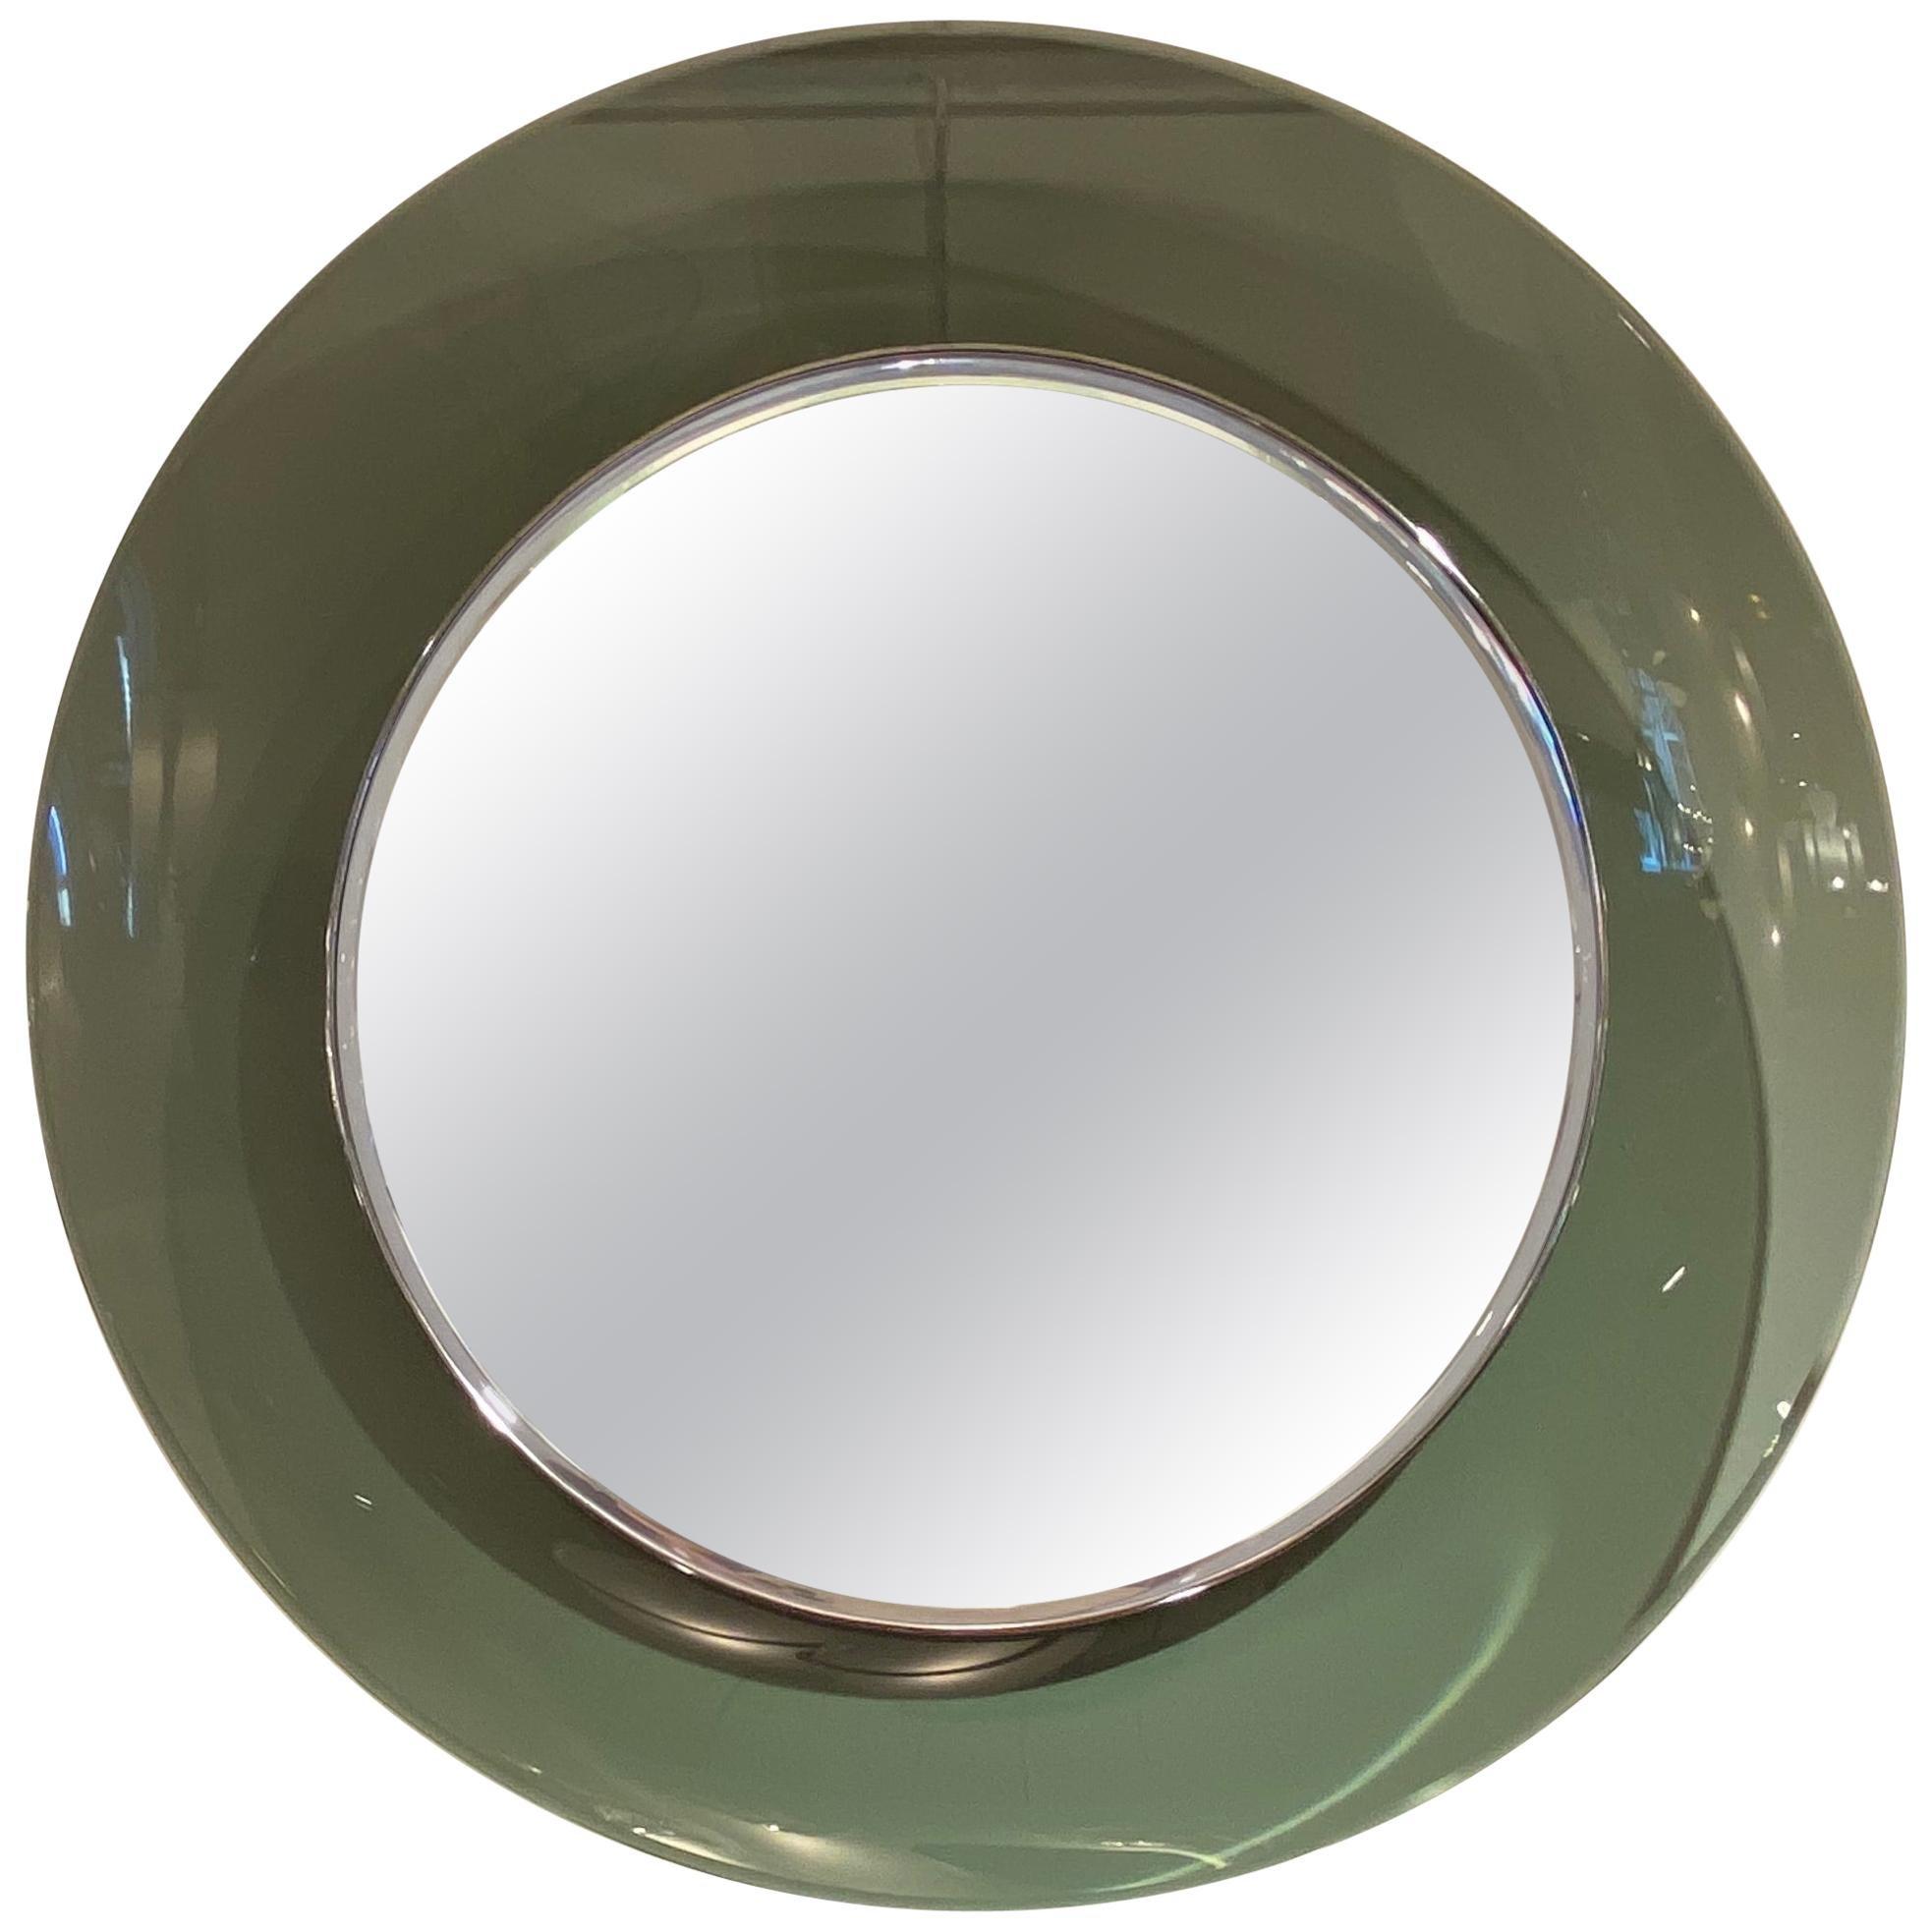 '1669' Model Circular Glass Mirror by Max Ingrand for Fontana Arte, Italy, 1960